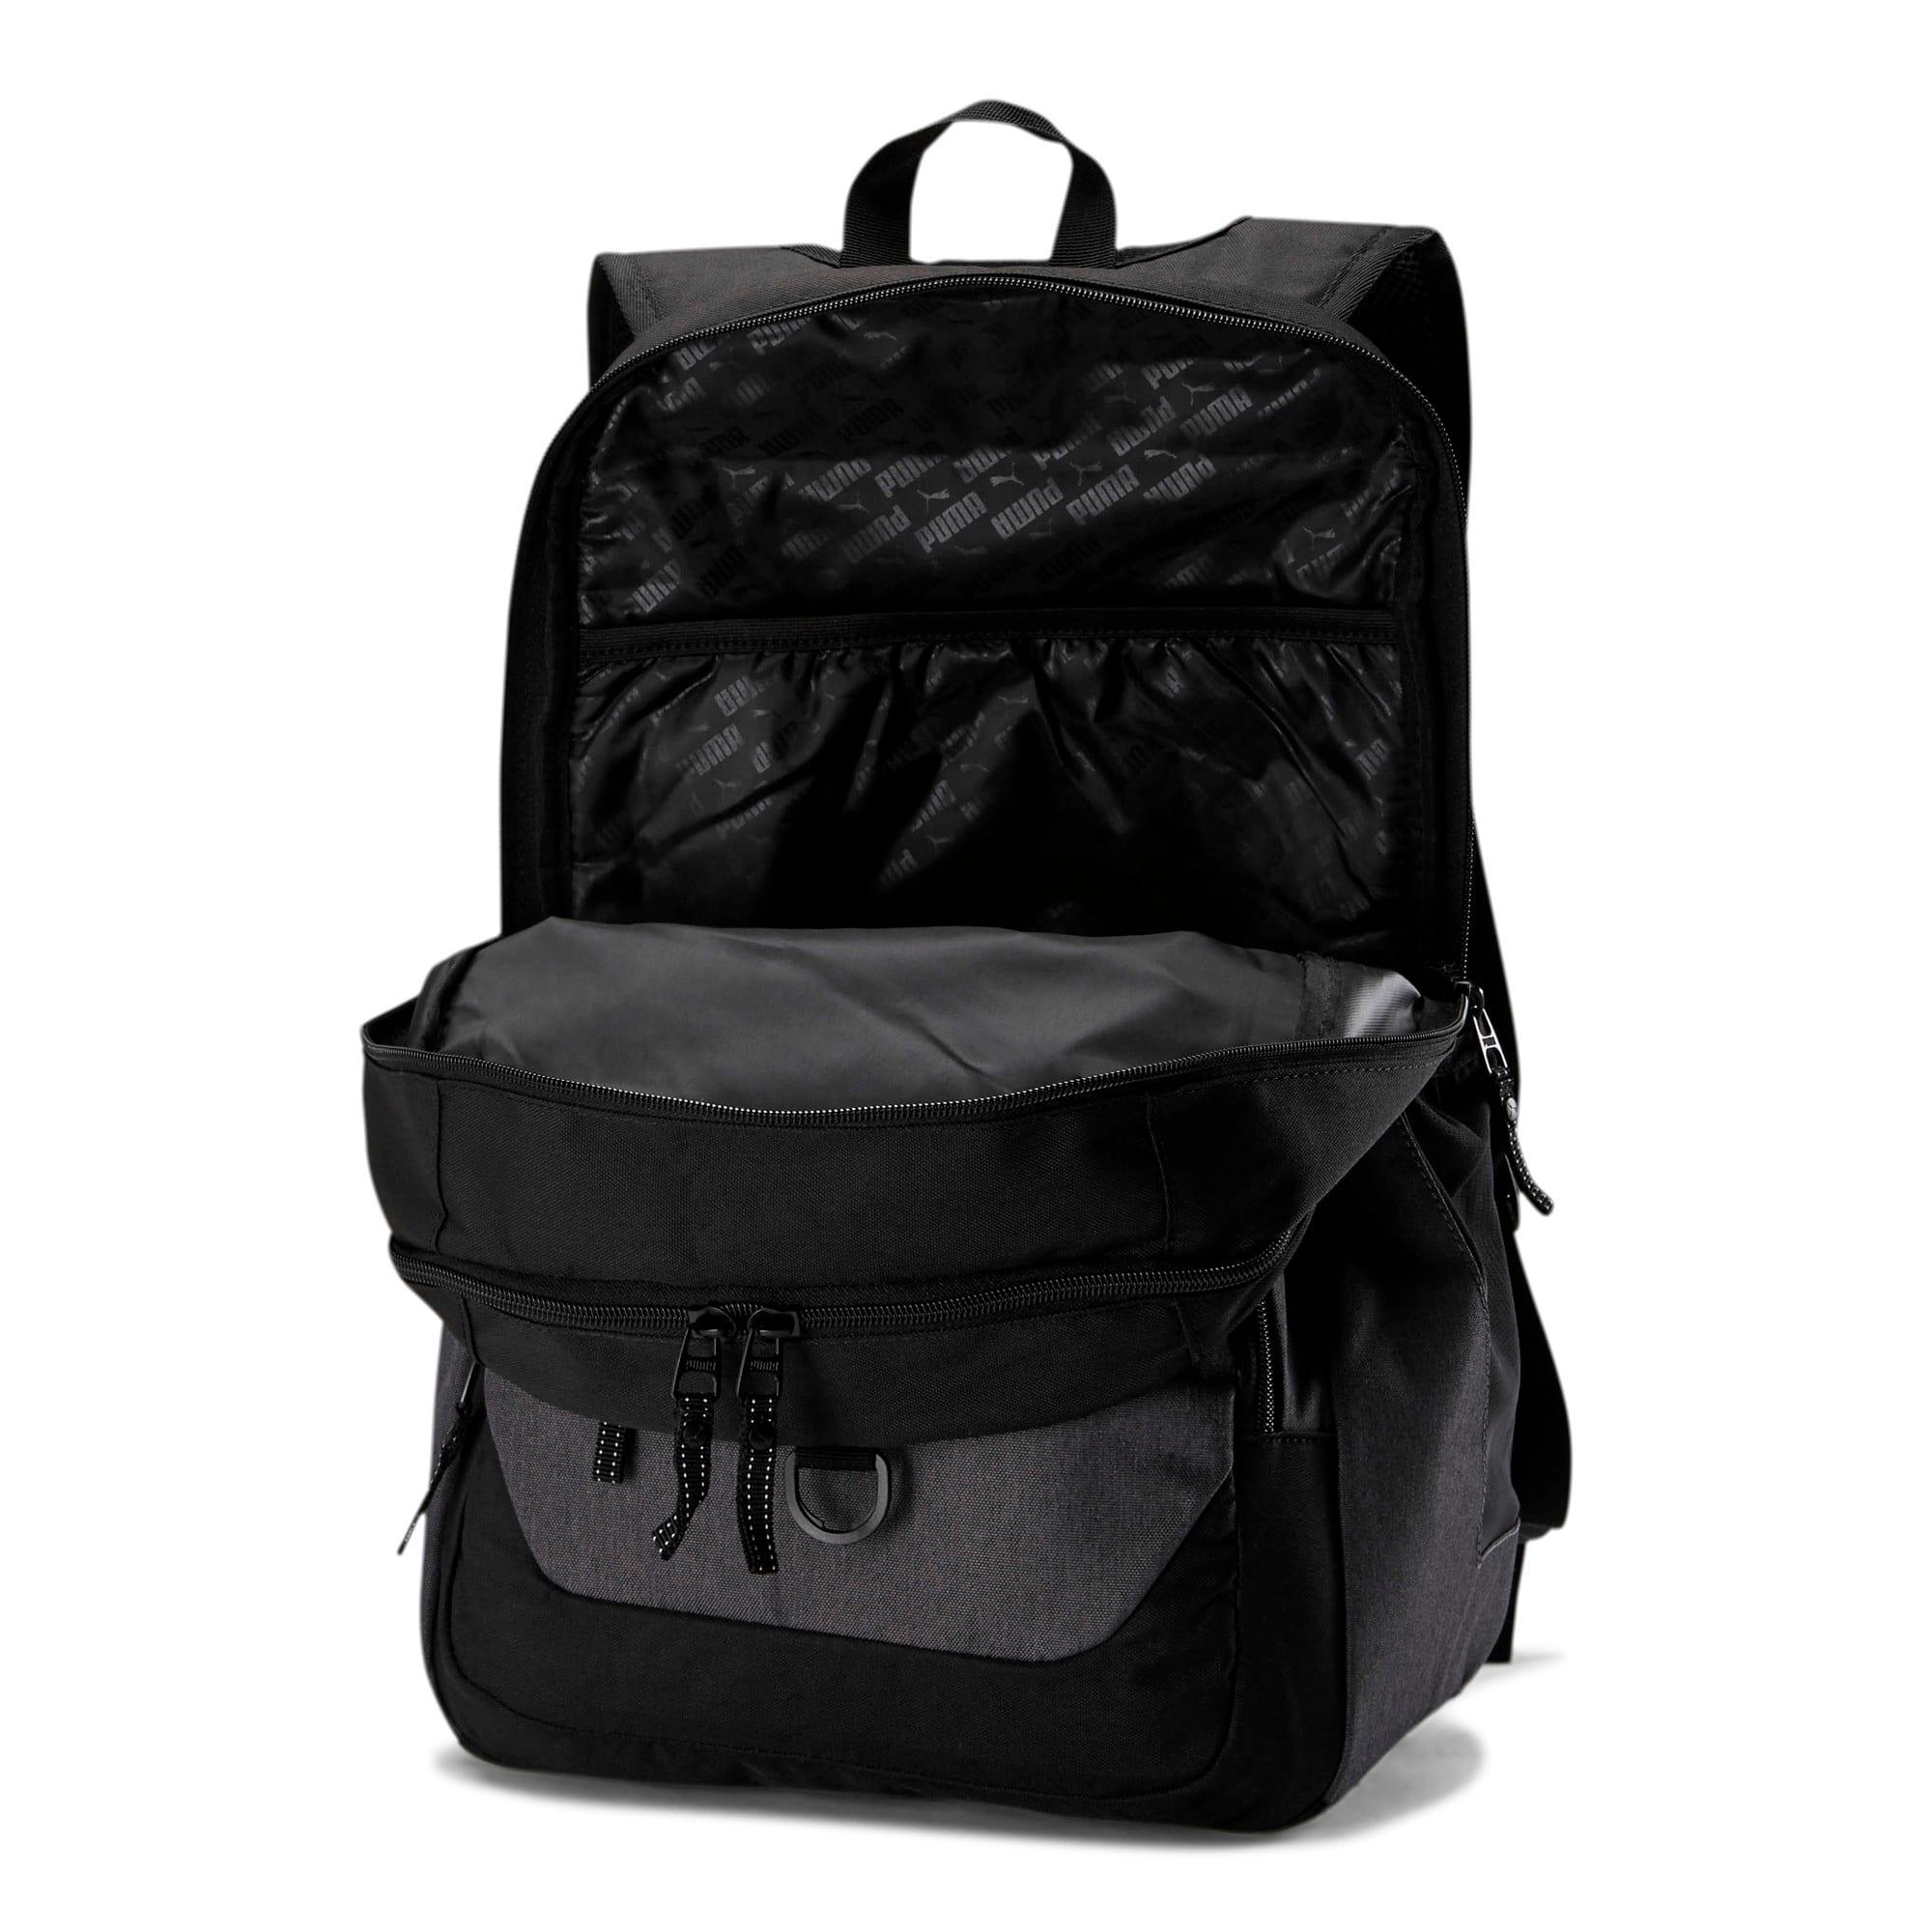 Thumbnail 3 of PUMA Everready Backpack, Dark Grey, medium